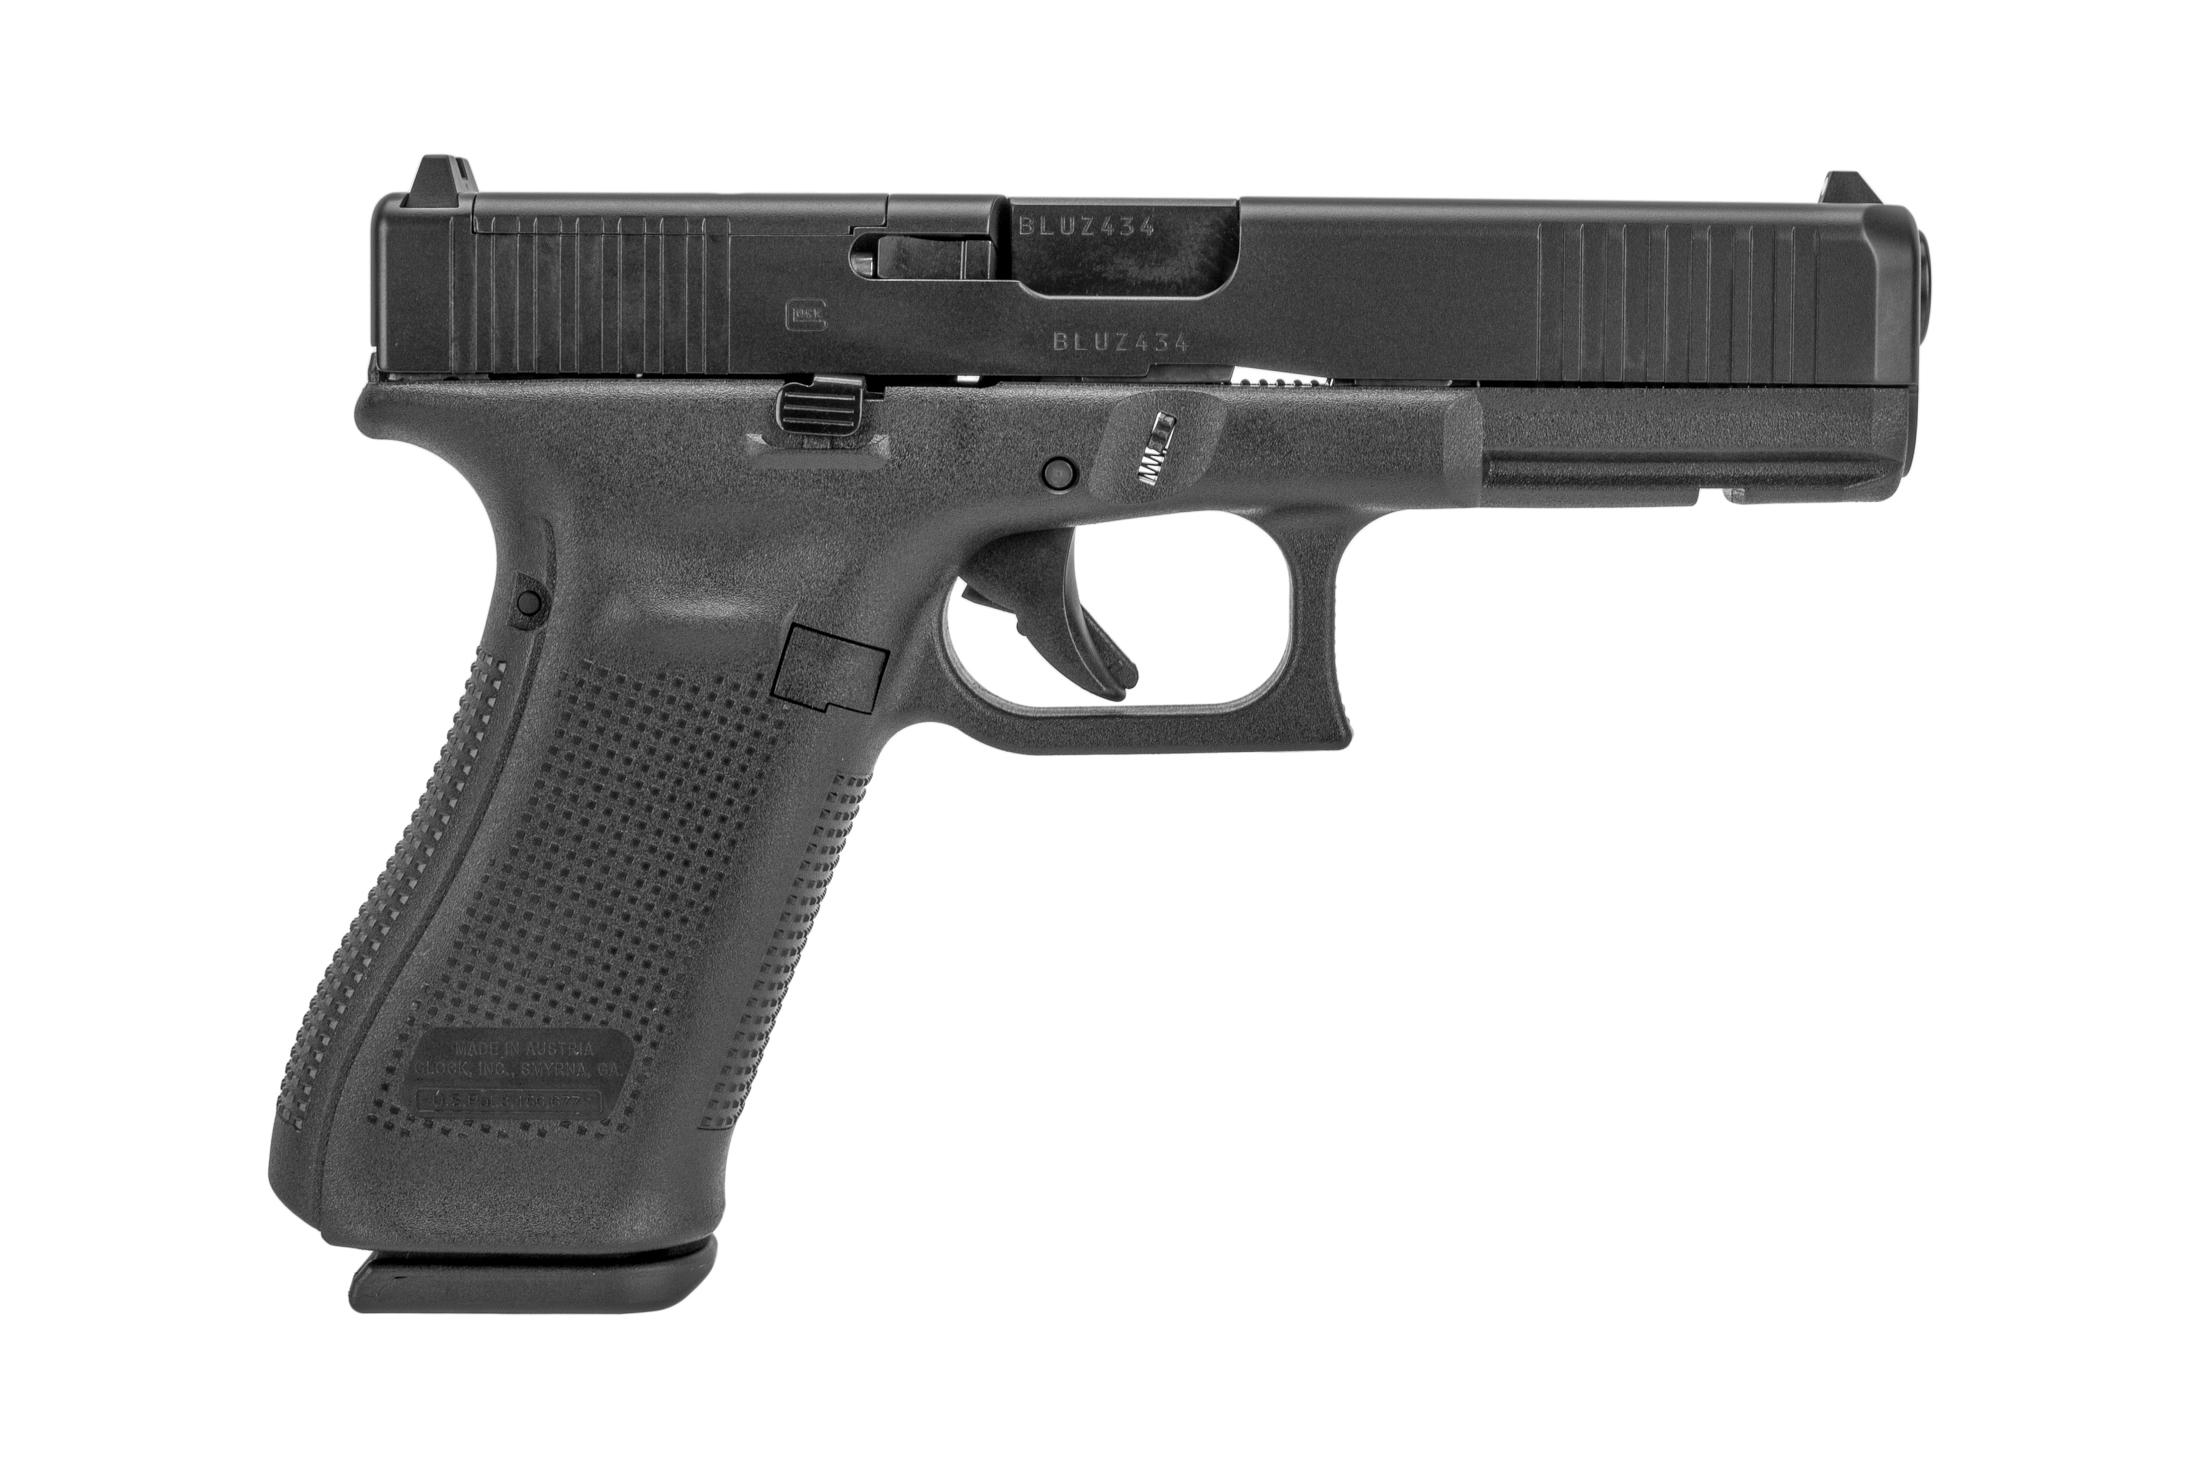 GLOCK Blue Label 17 GEN 5 MOS 9mm Fixed Sights 17RD - Black